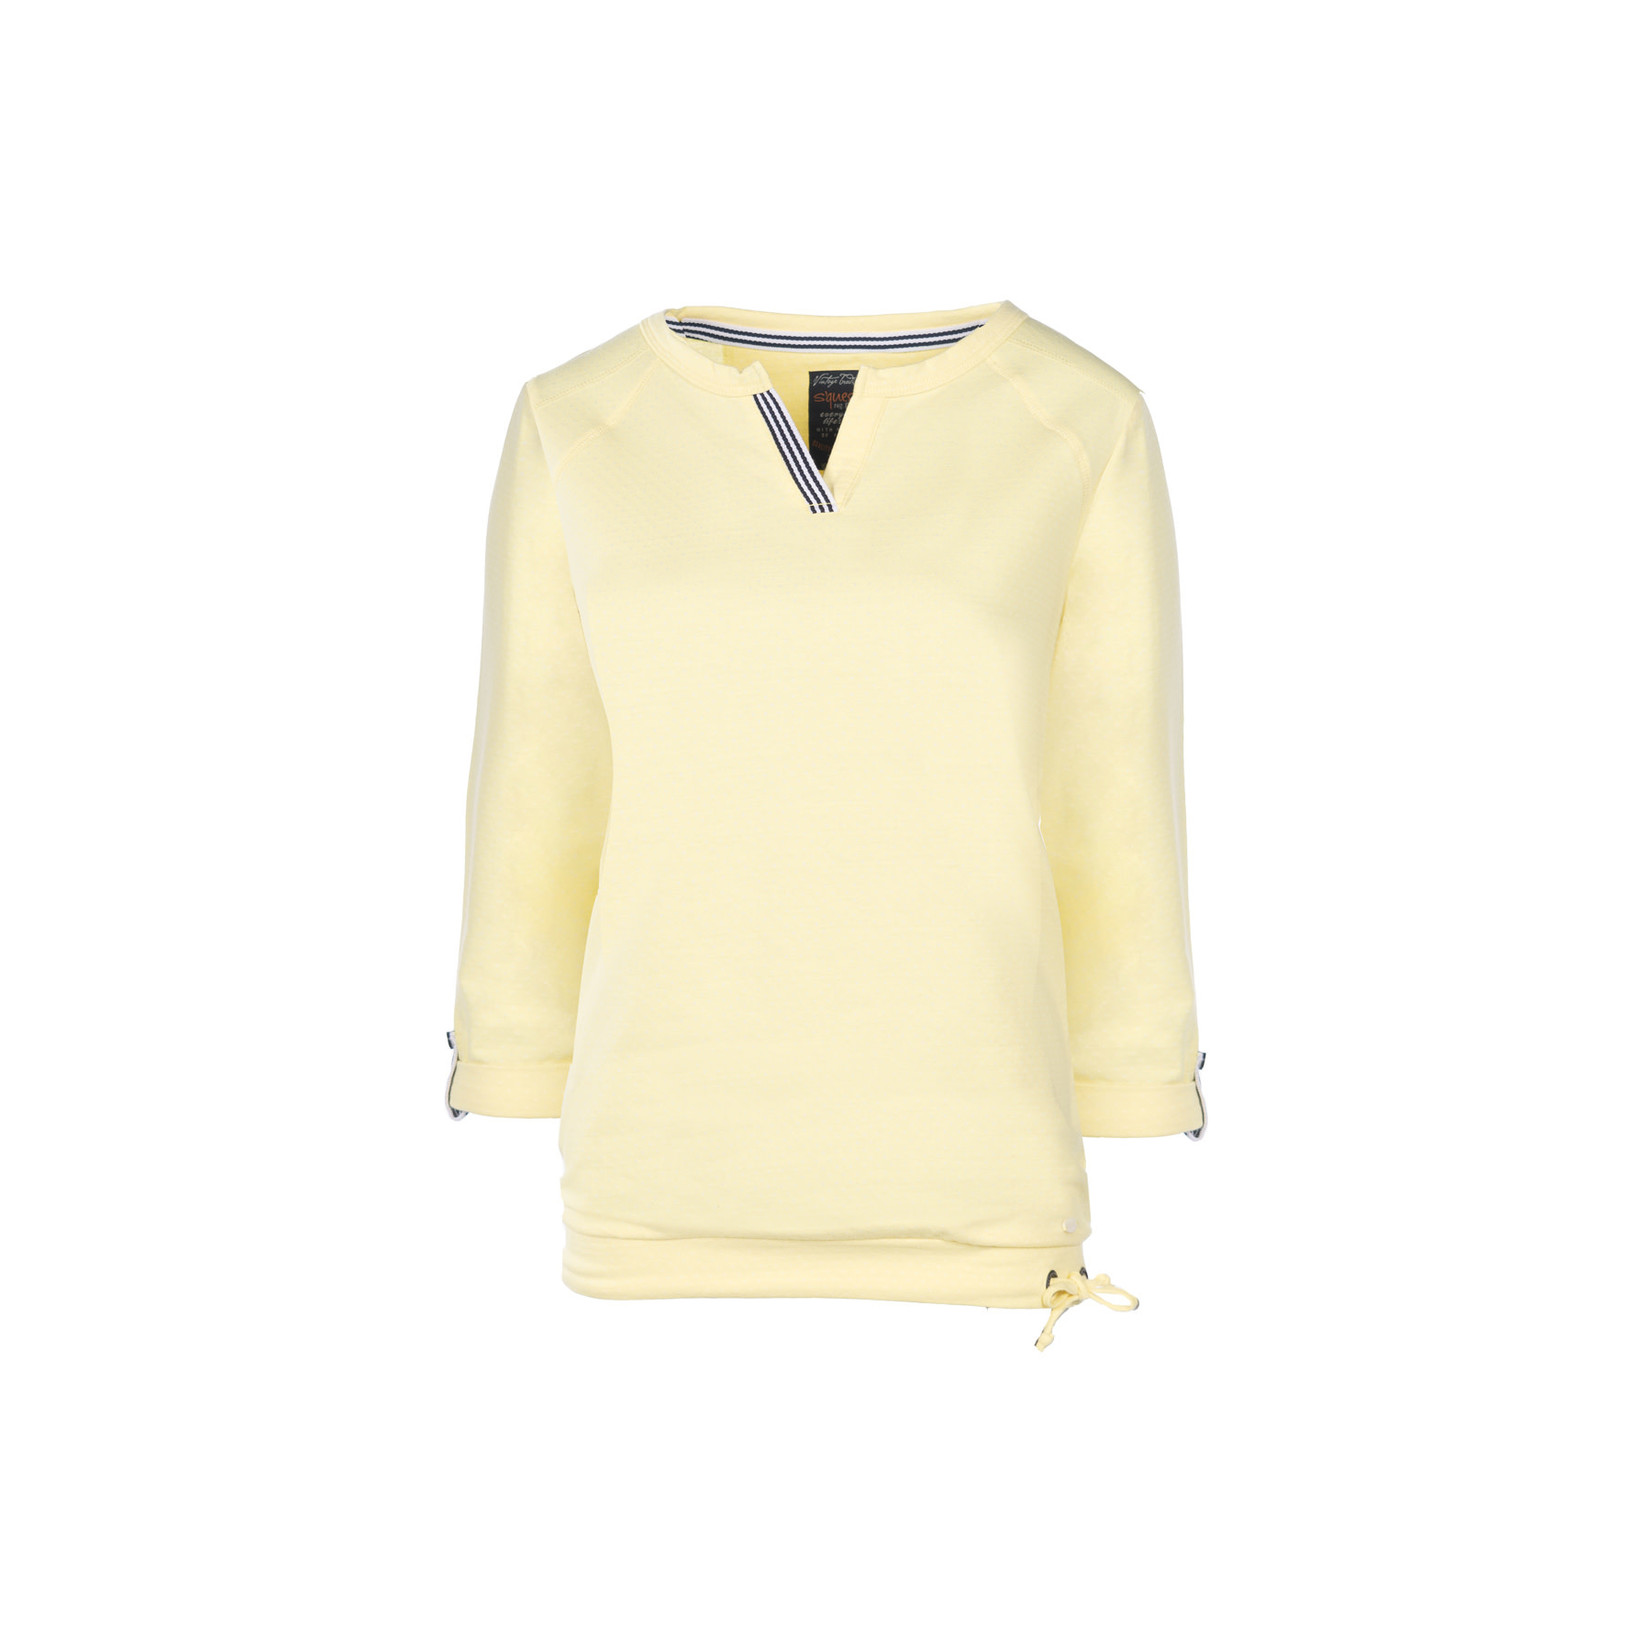 Soquesto Soquesto shirt yellow 6180-501840